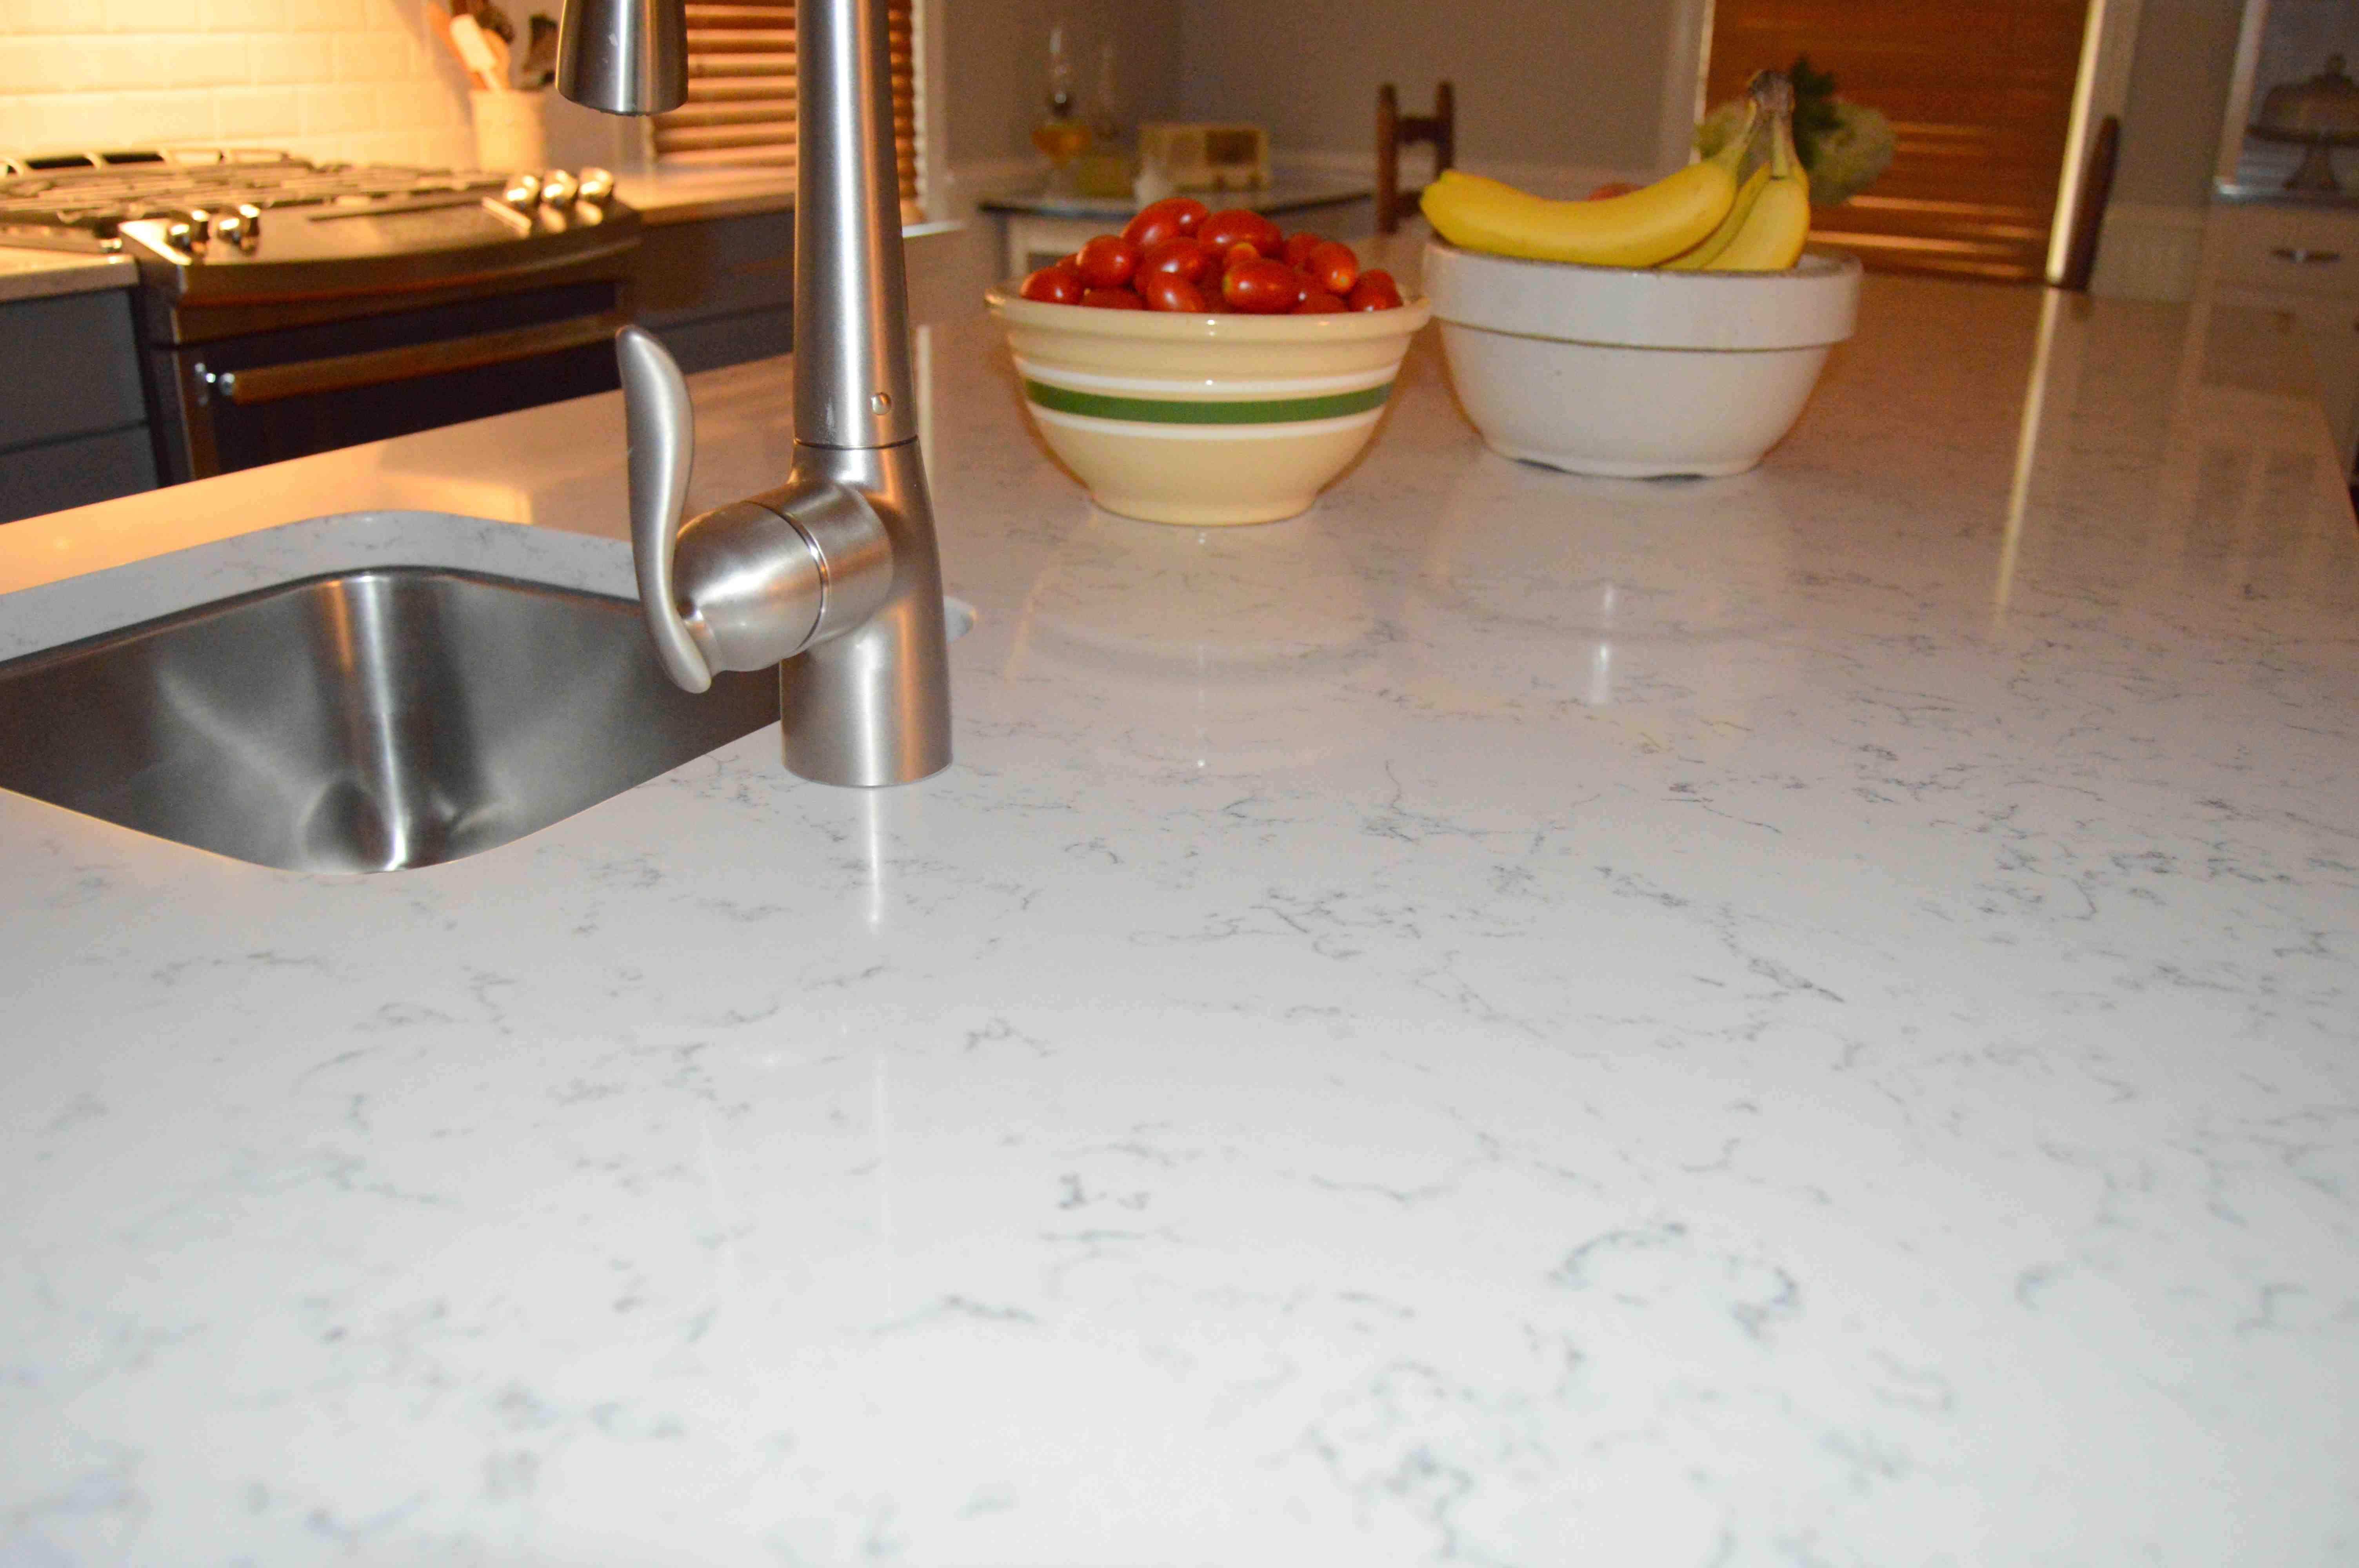 Carr Kitchen Remodel Hatchett Design Remodel